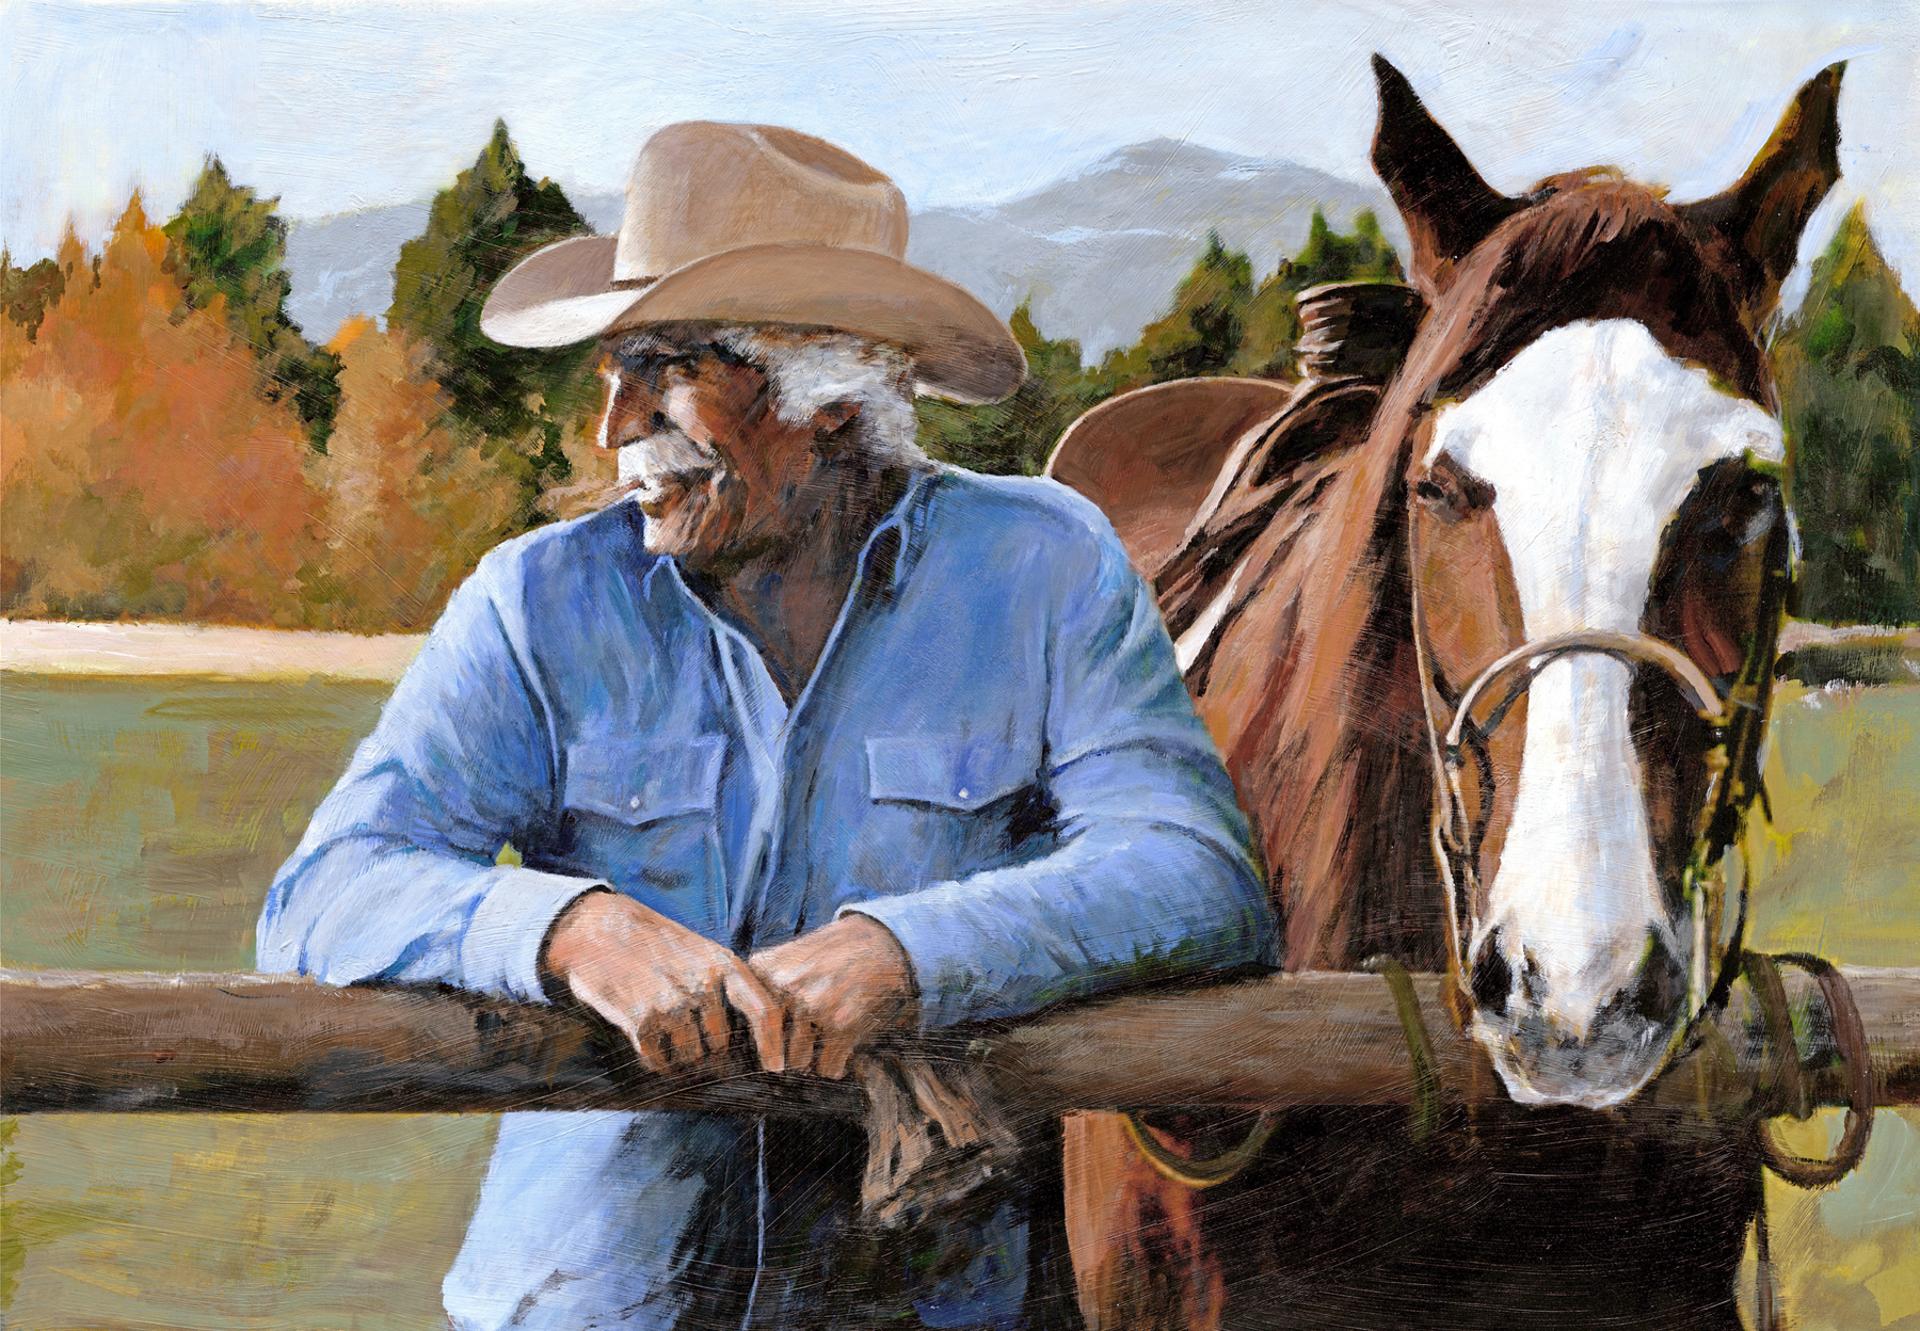 Montana Hawk by Aldo Luongo